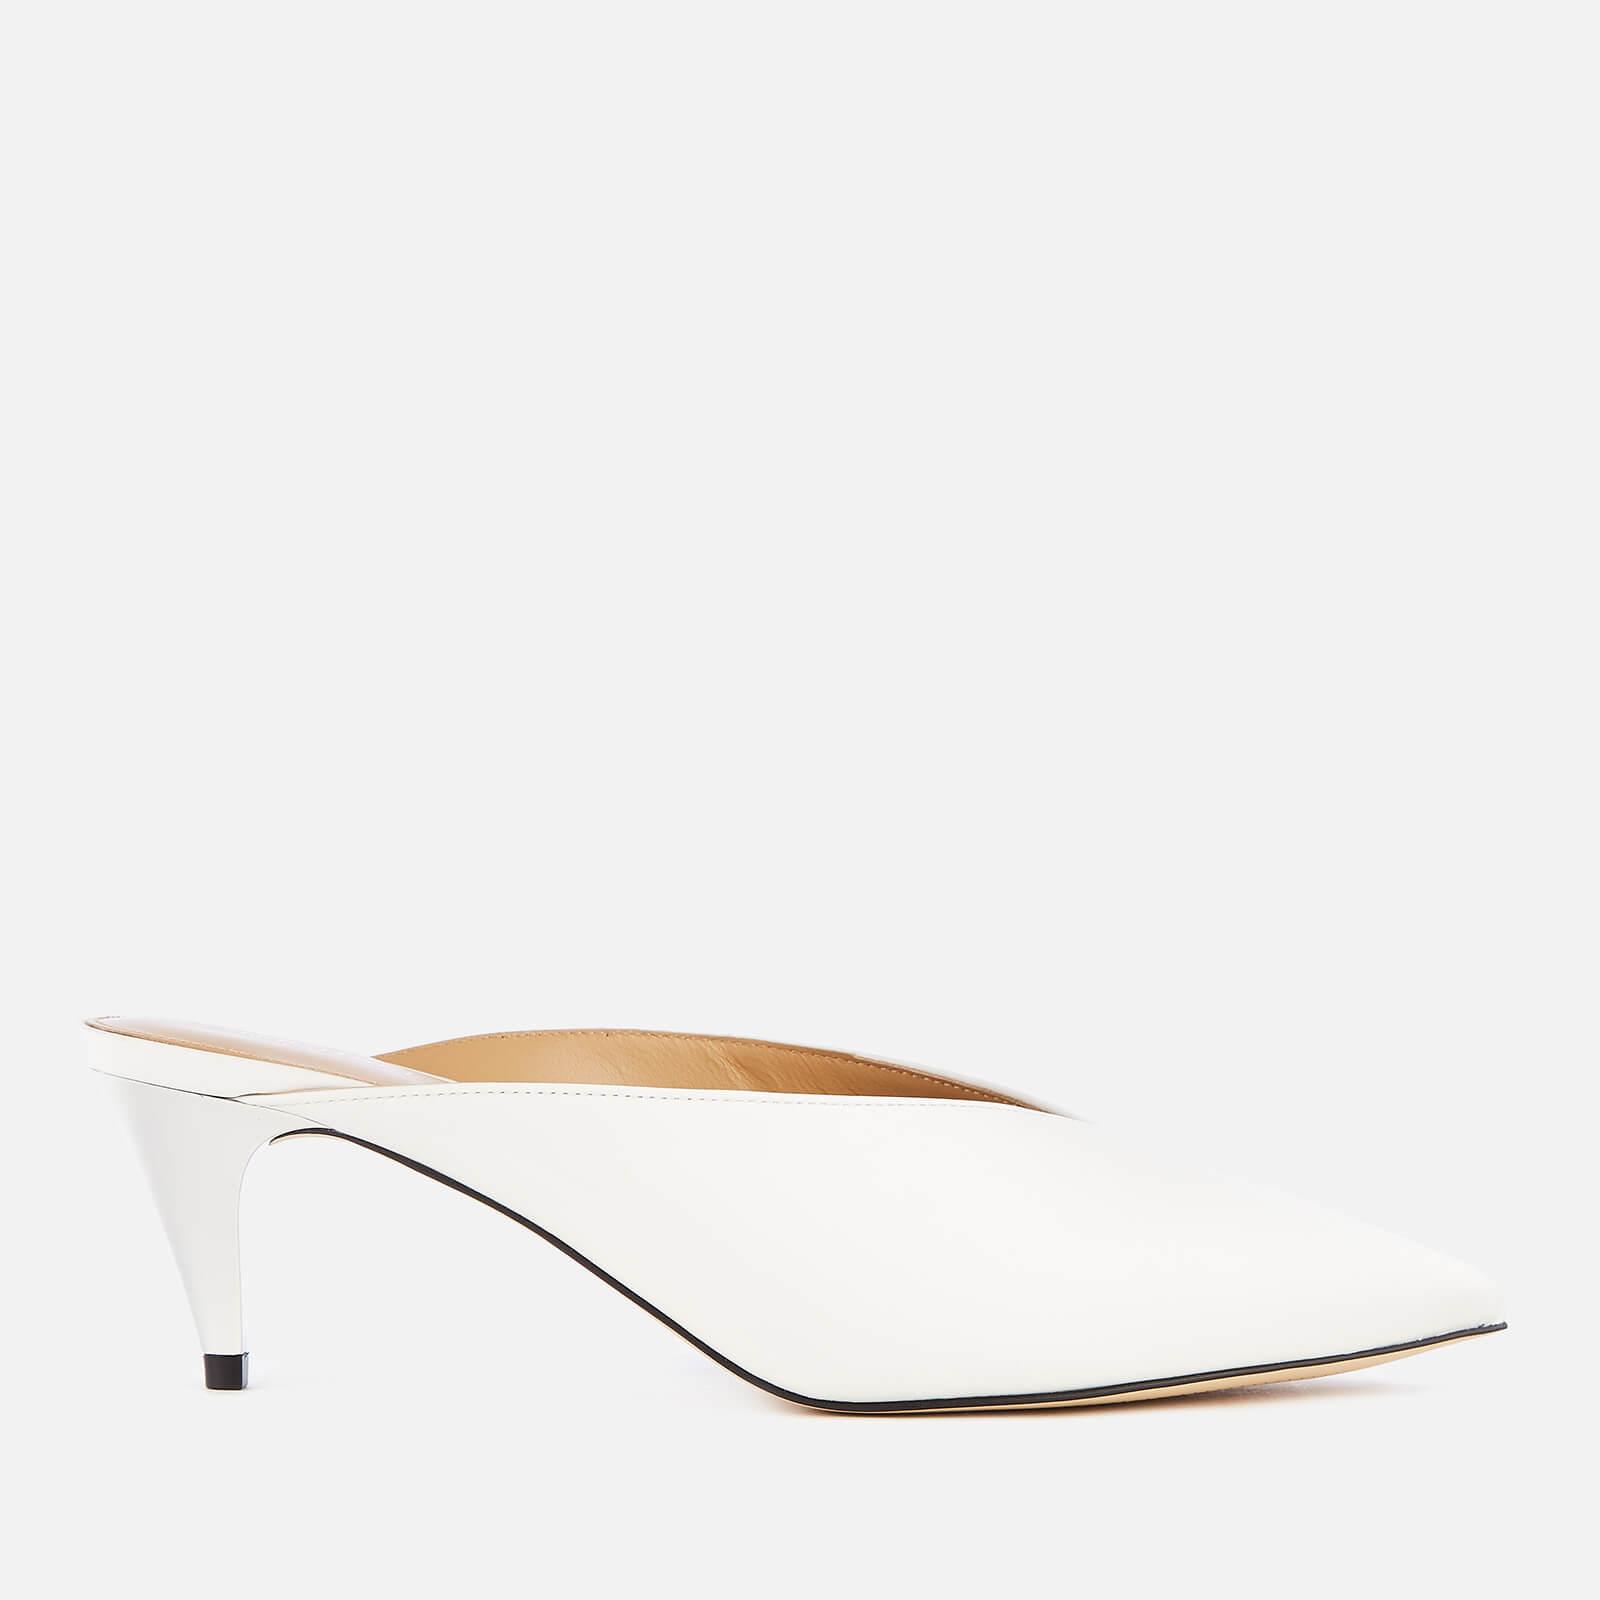 MICHAEL MICHAEL KORS Women's Cambria Leather Mules - Optic White - UK 5/US 8 - White